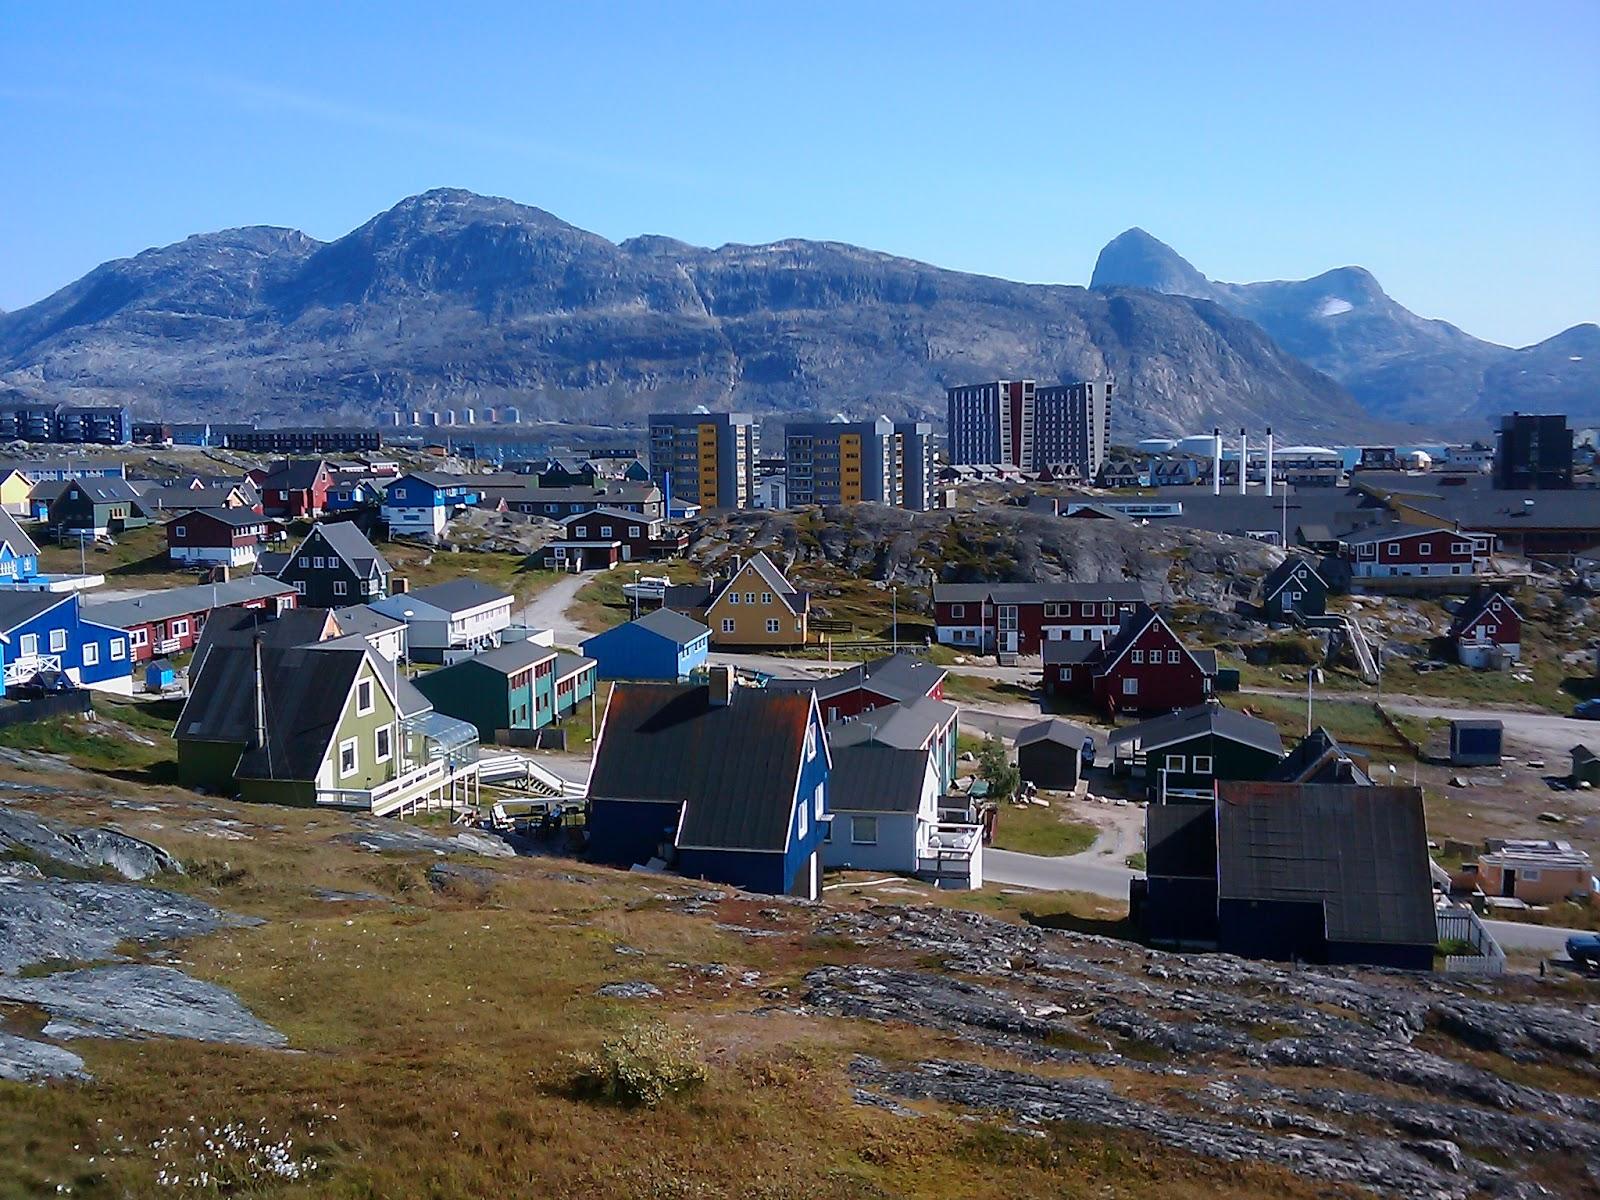 Frk. Soja i Grønland: Bolig, arbejde og Nuuk